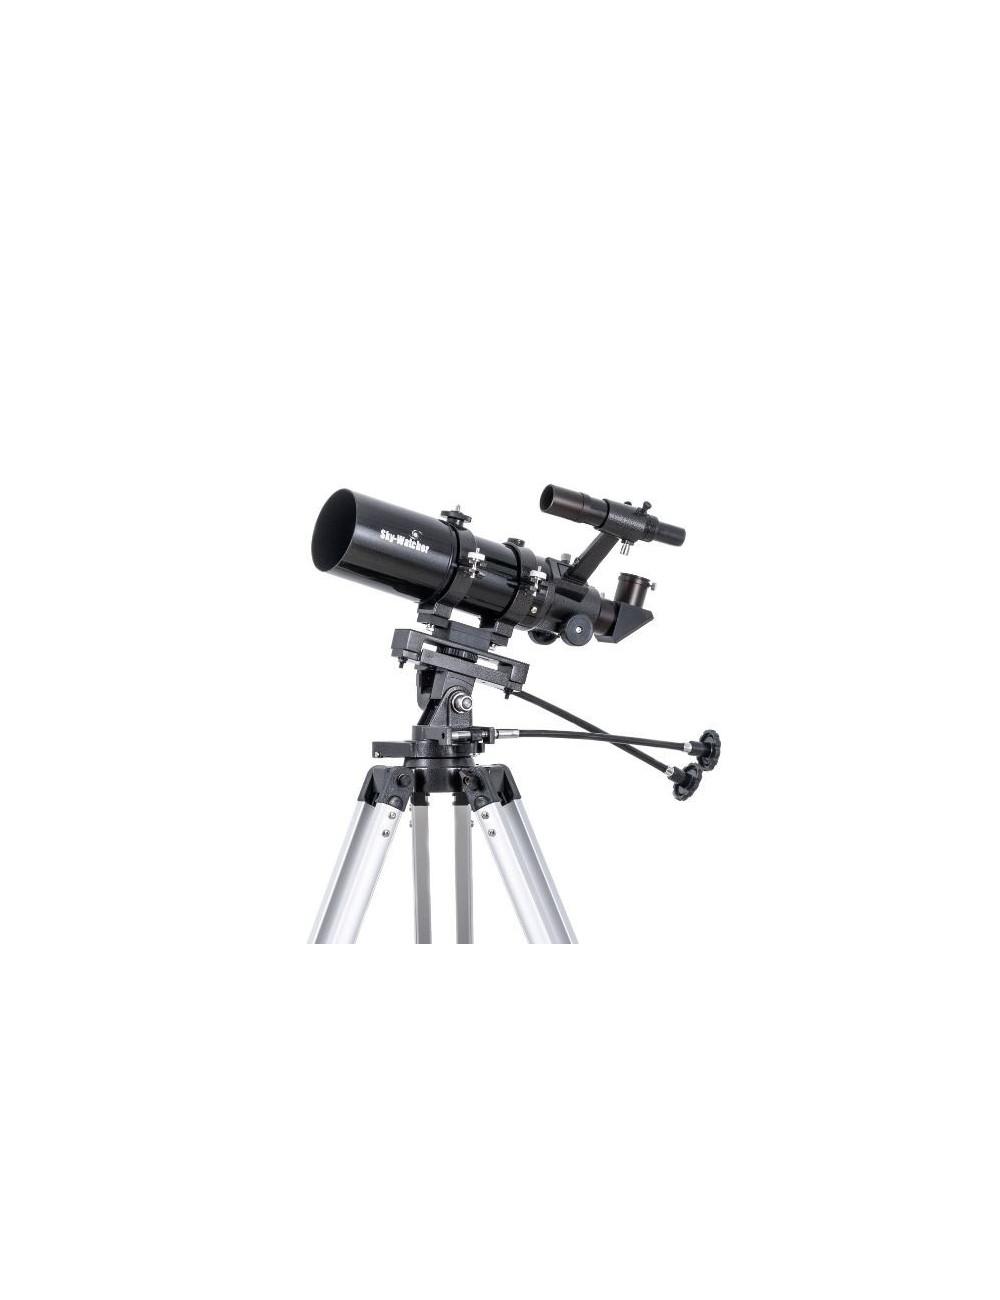 Sky Watcher 80/400 AZ3